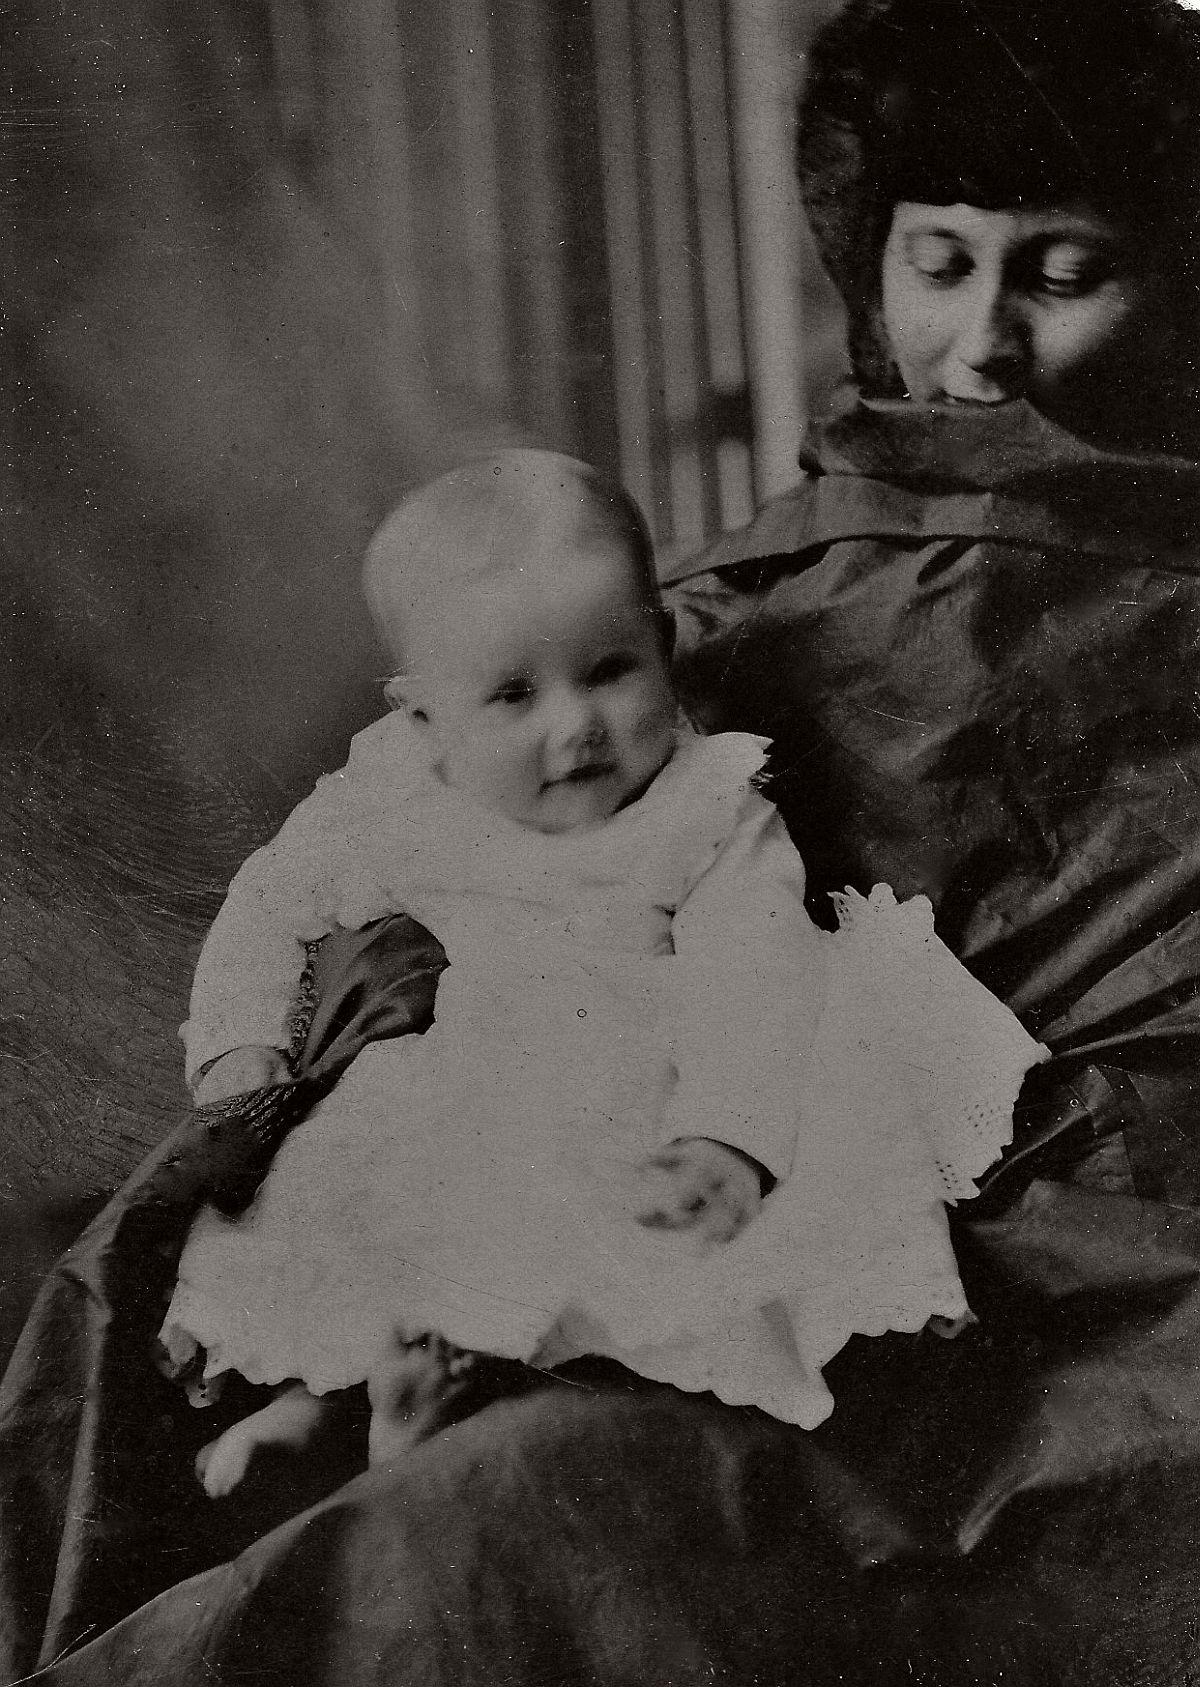 victorian-era-tintype-portraits-of-children-1870s-and-1880s-101